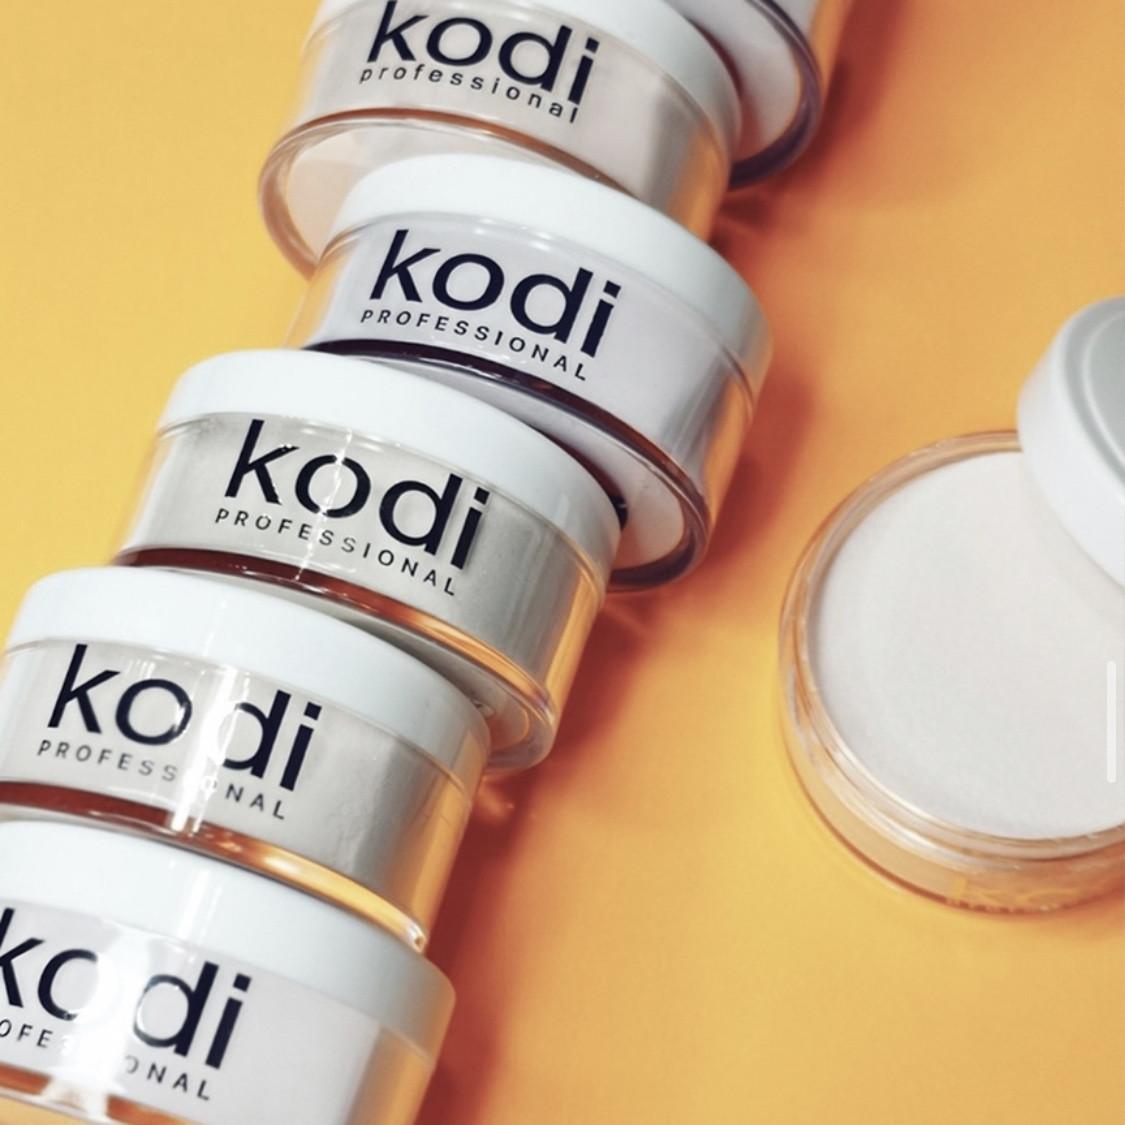 Камуфлирующая акриловая пудра с шиммером Glamour French (22 г) Kodi Professional